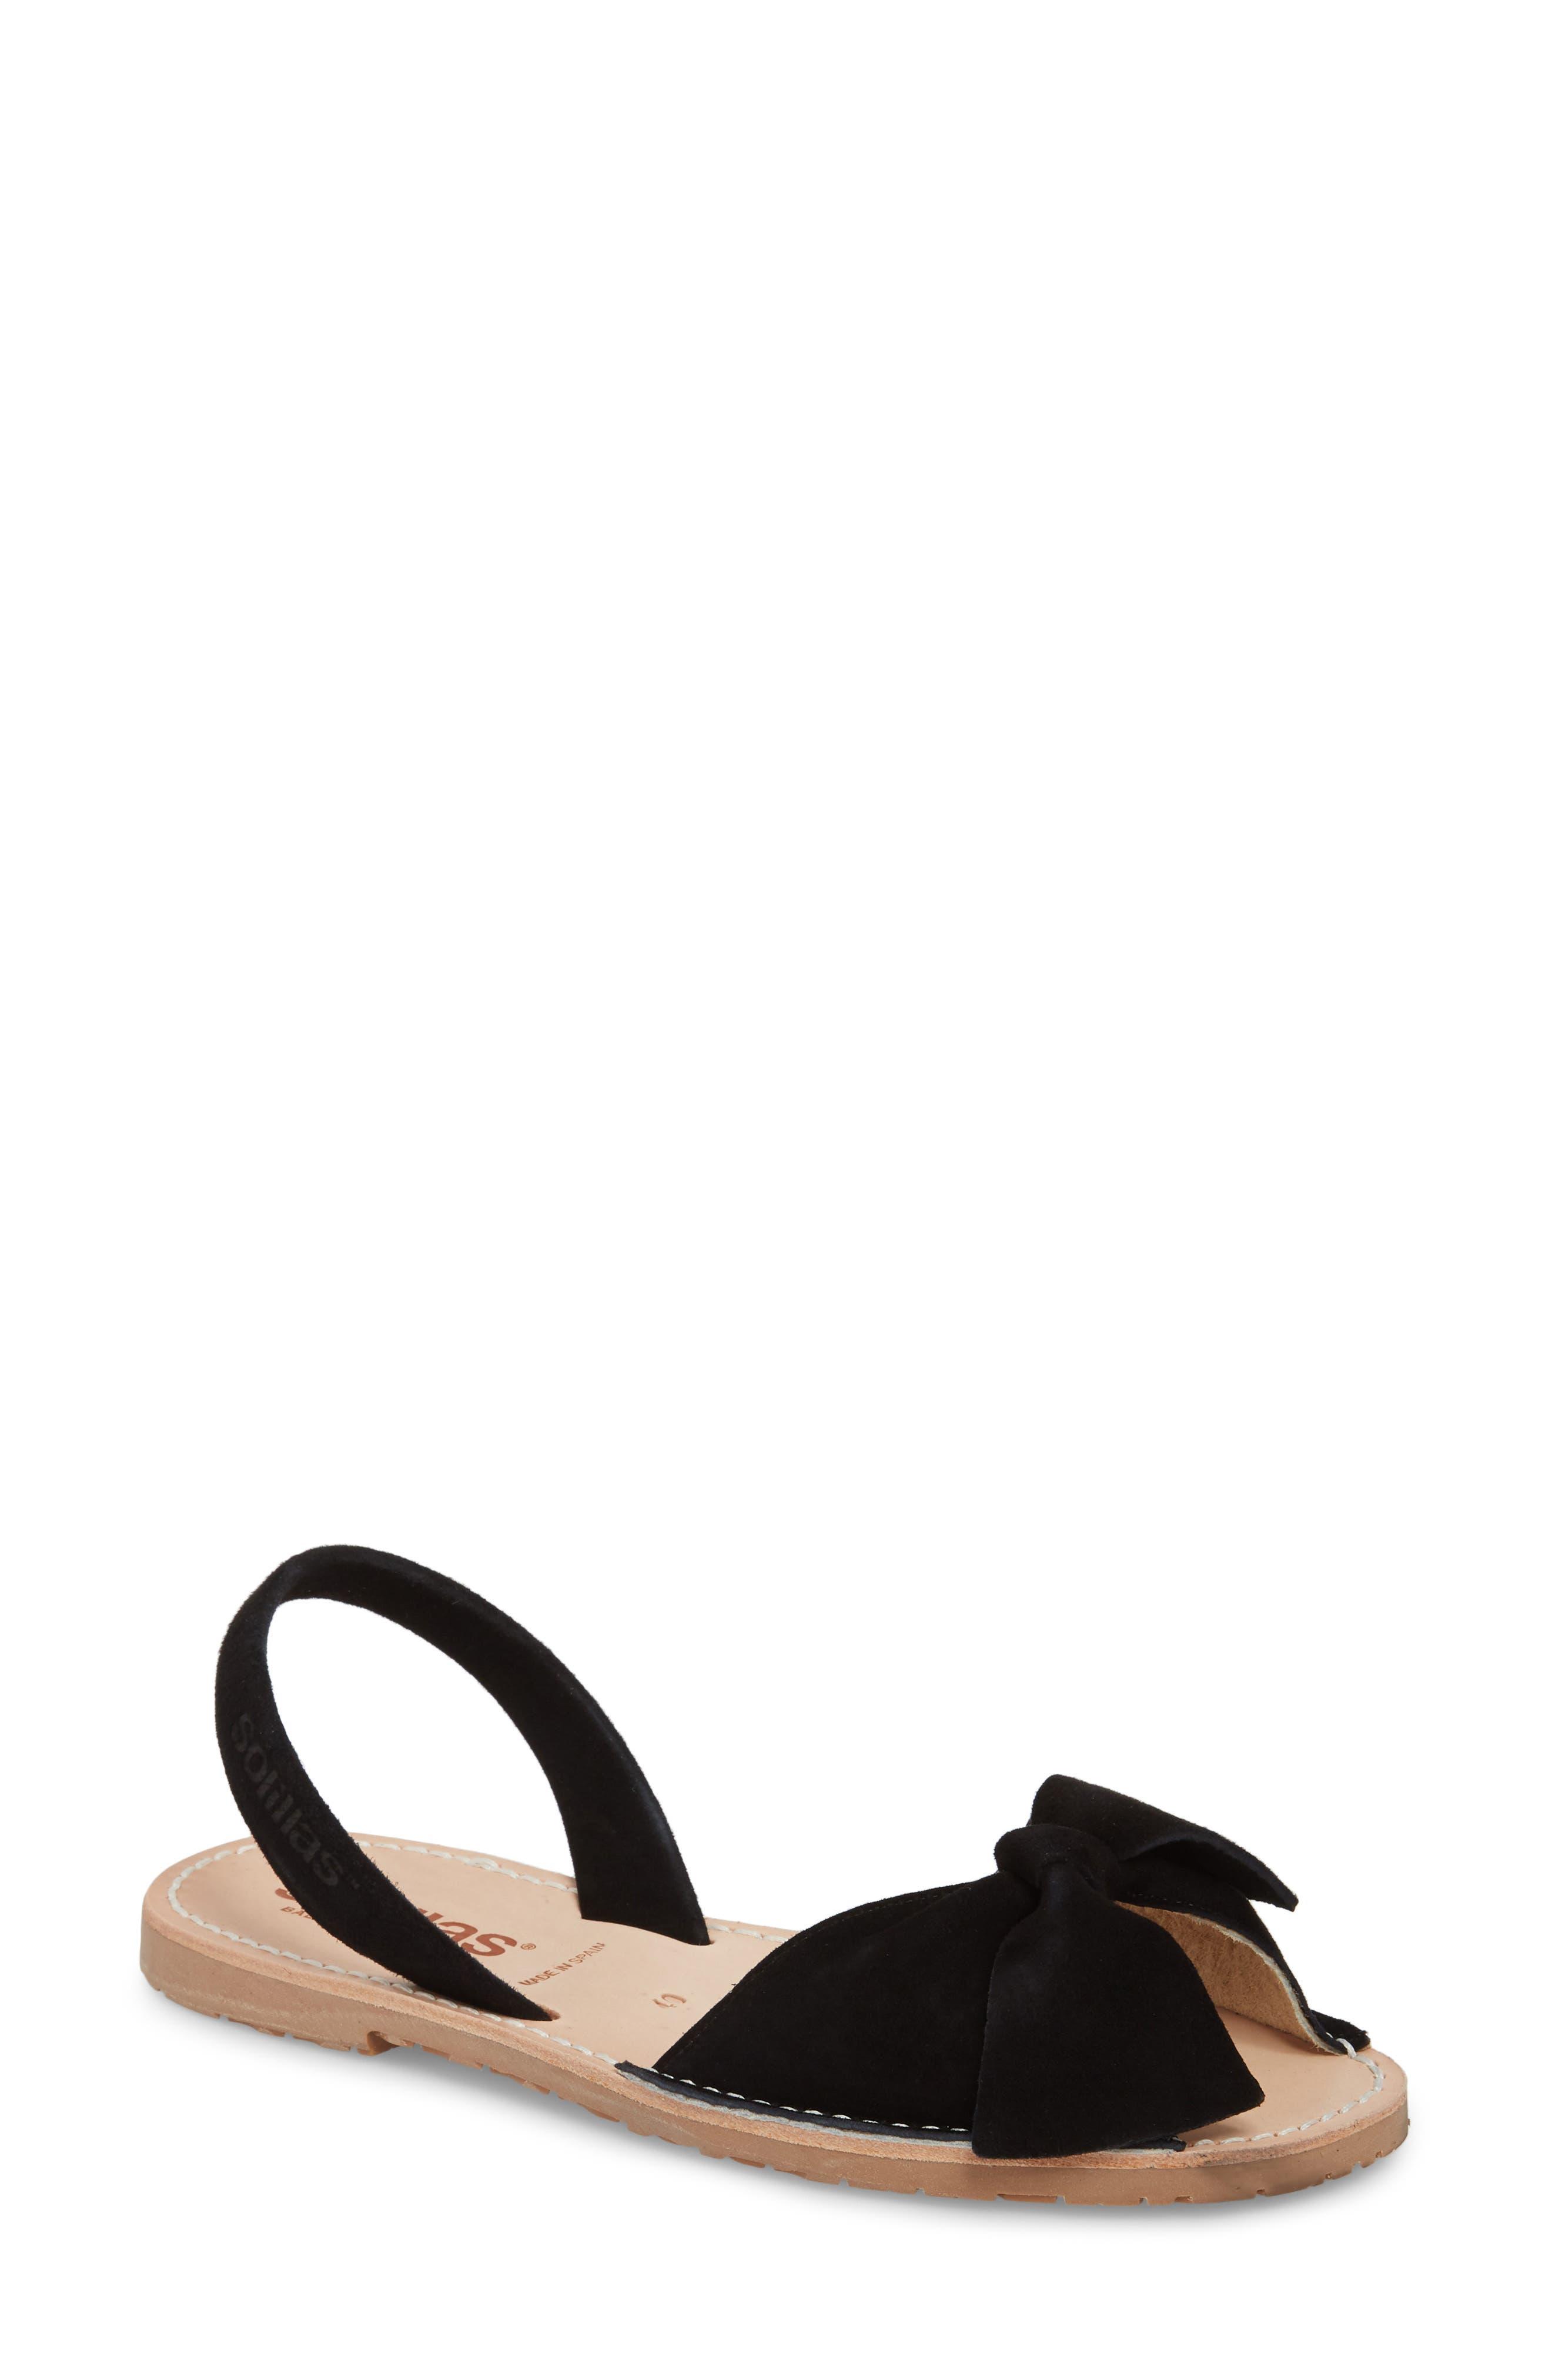 Bow Sandal,                         Main,                         color, BLACK